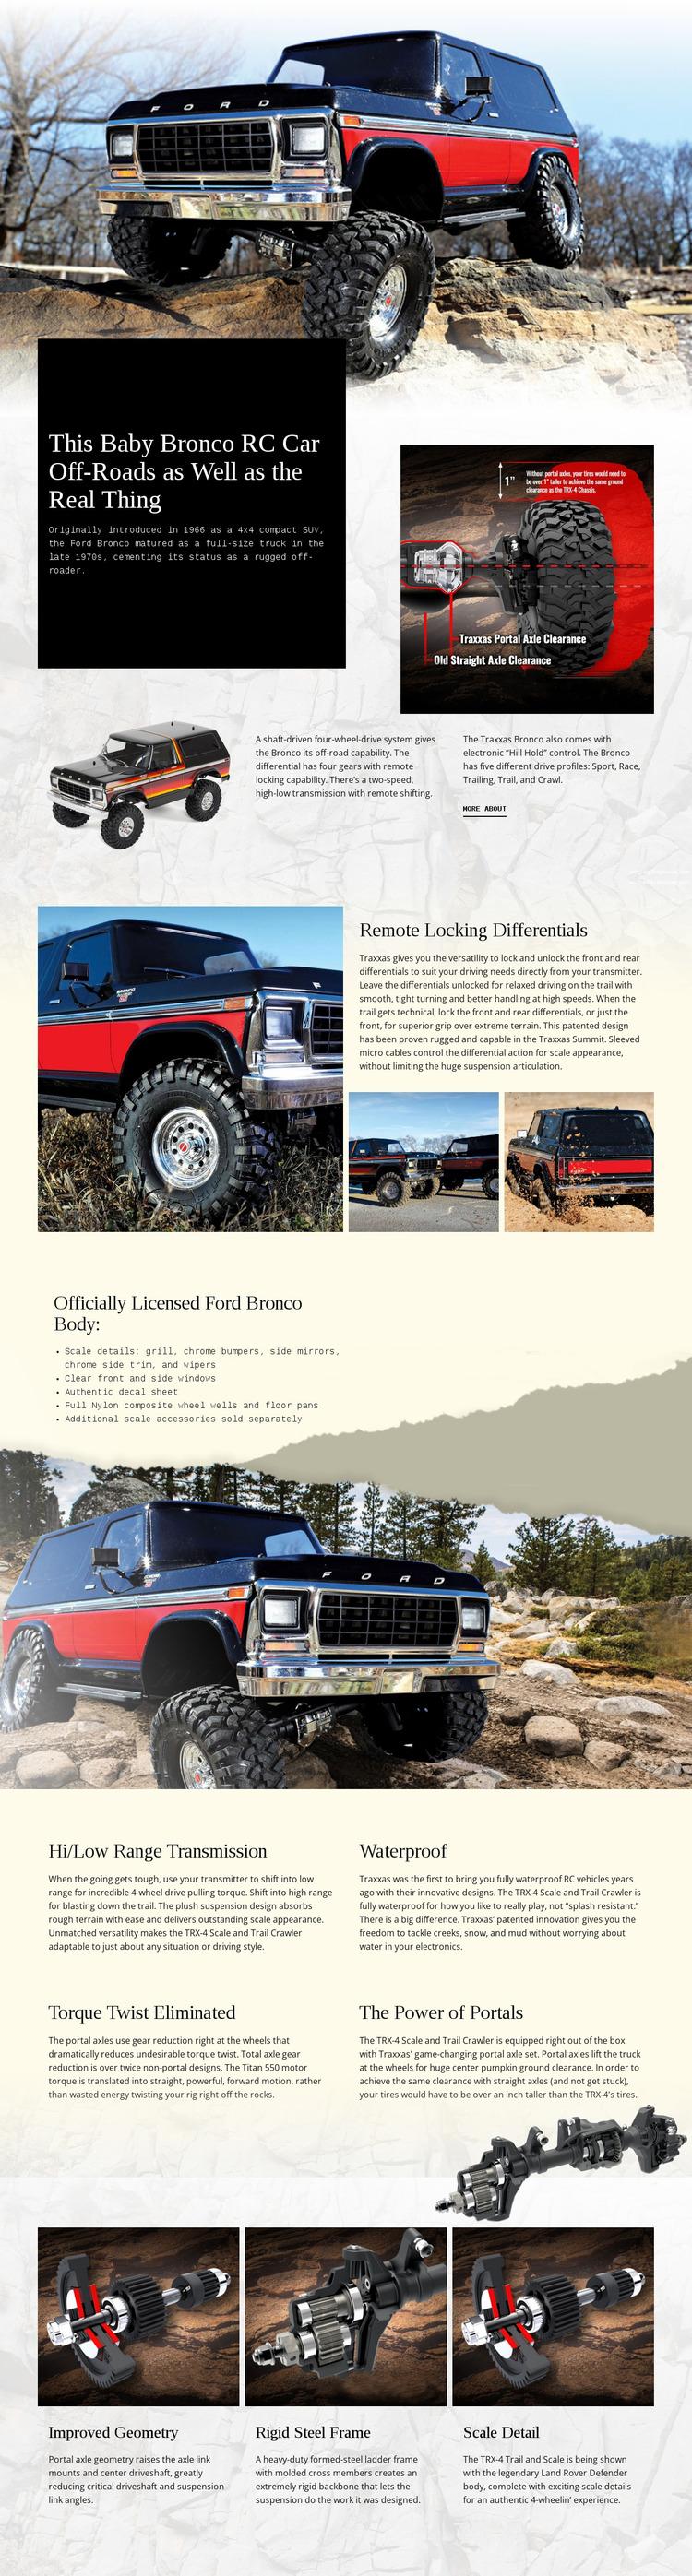 Bronco Rc Car Website Mockup